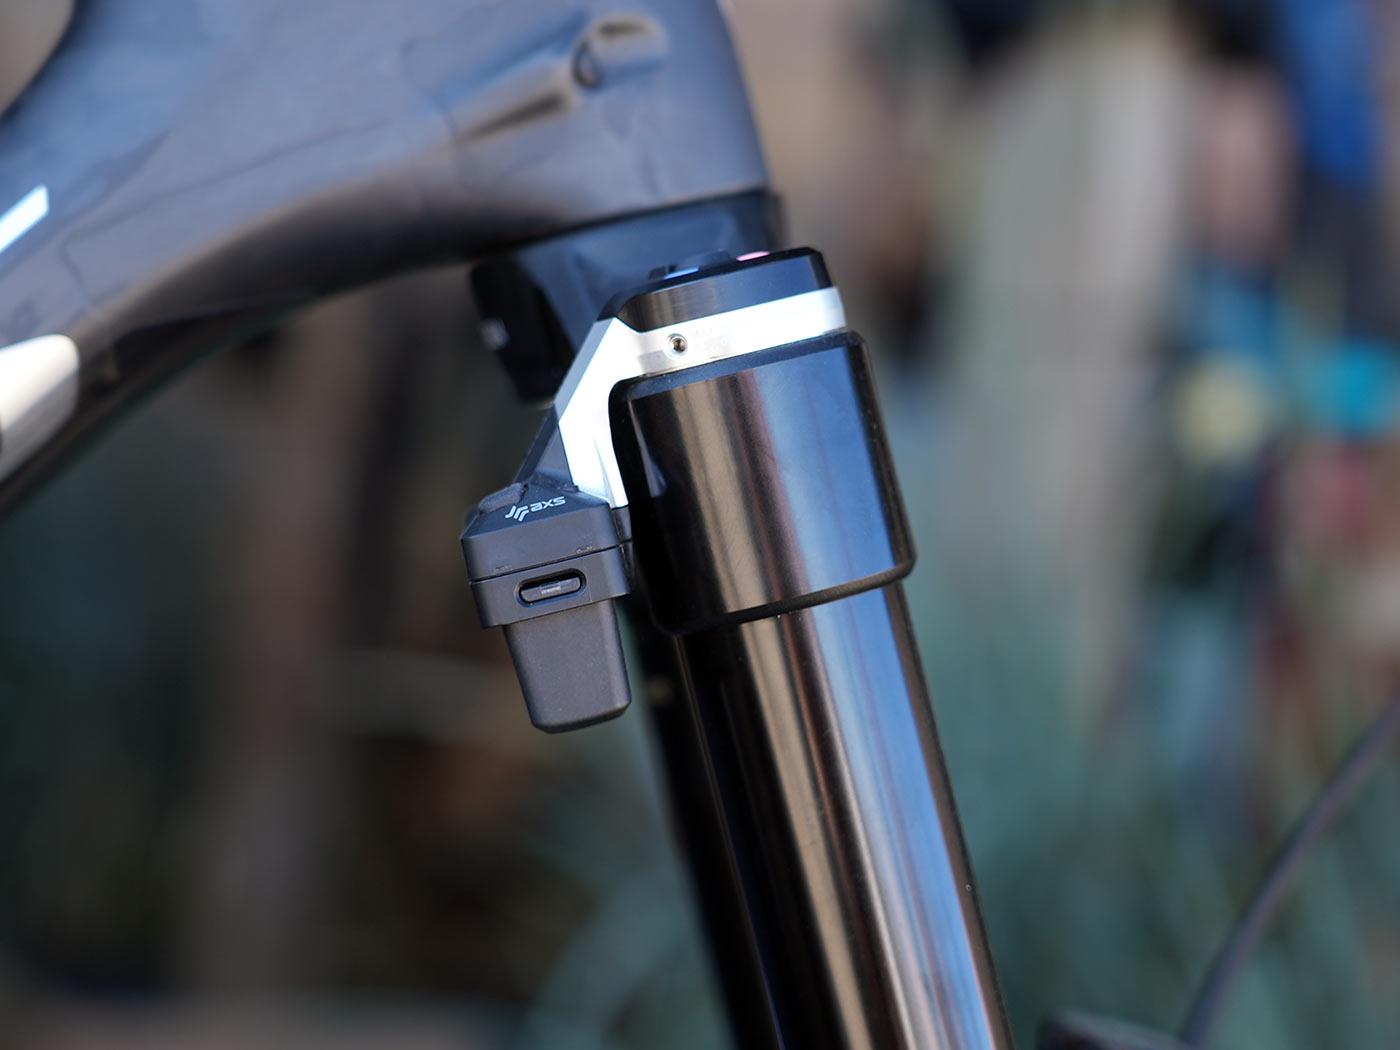 rockshox flight attendant electronic suspension controls on a fork